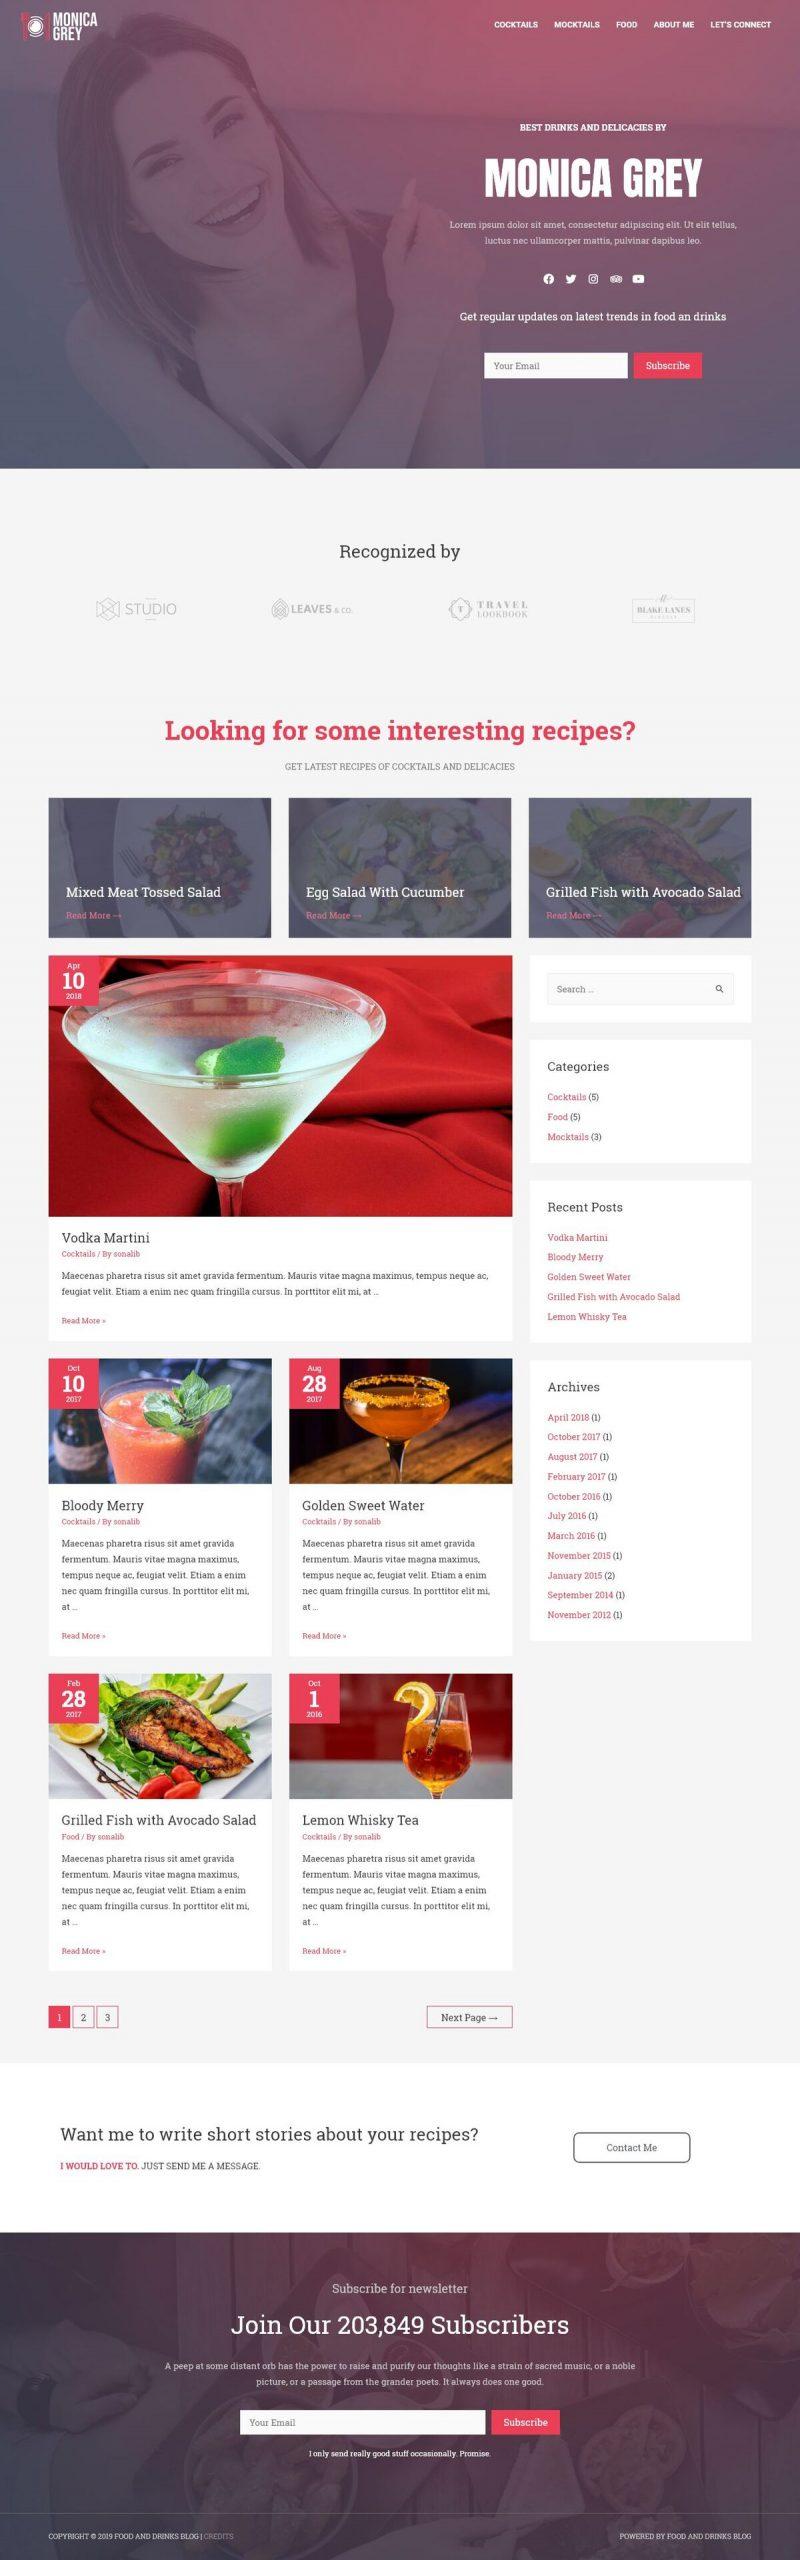 id-18622-food-and-drinks-blog-resize.jpg